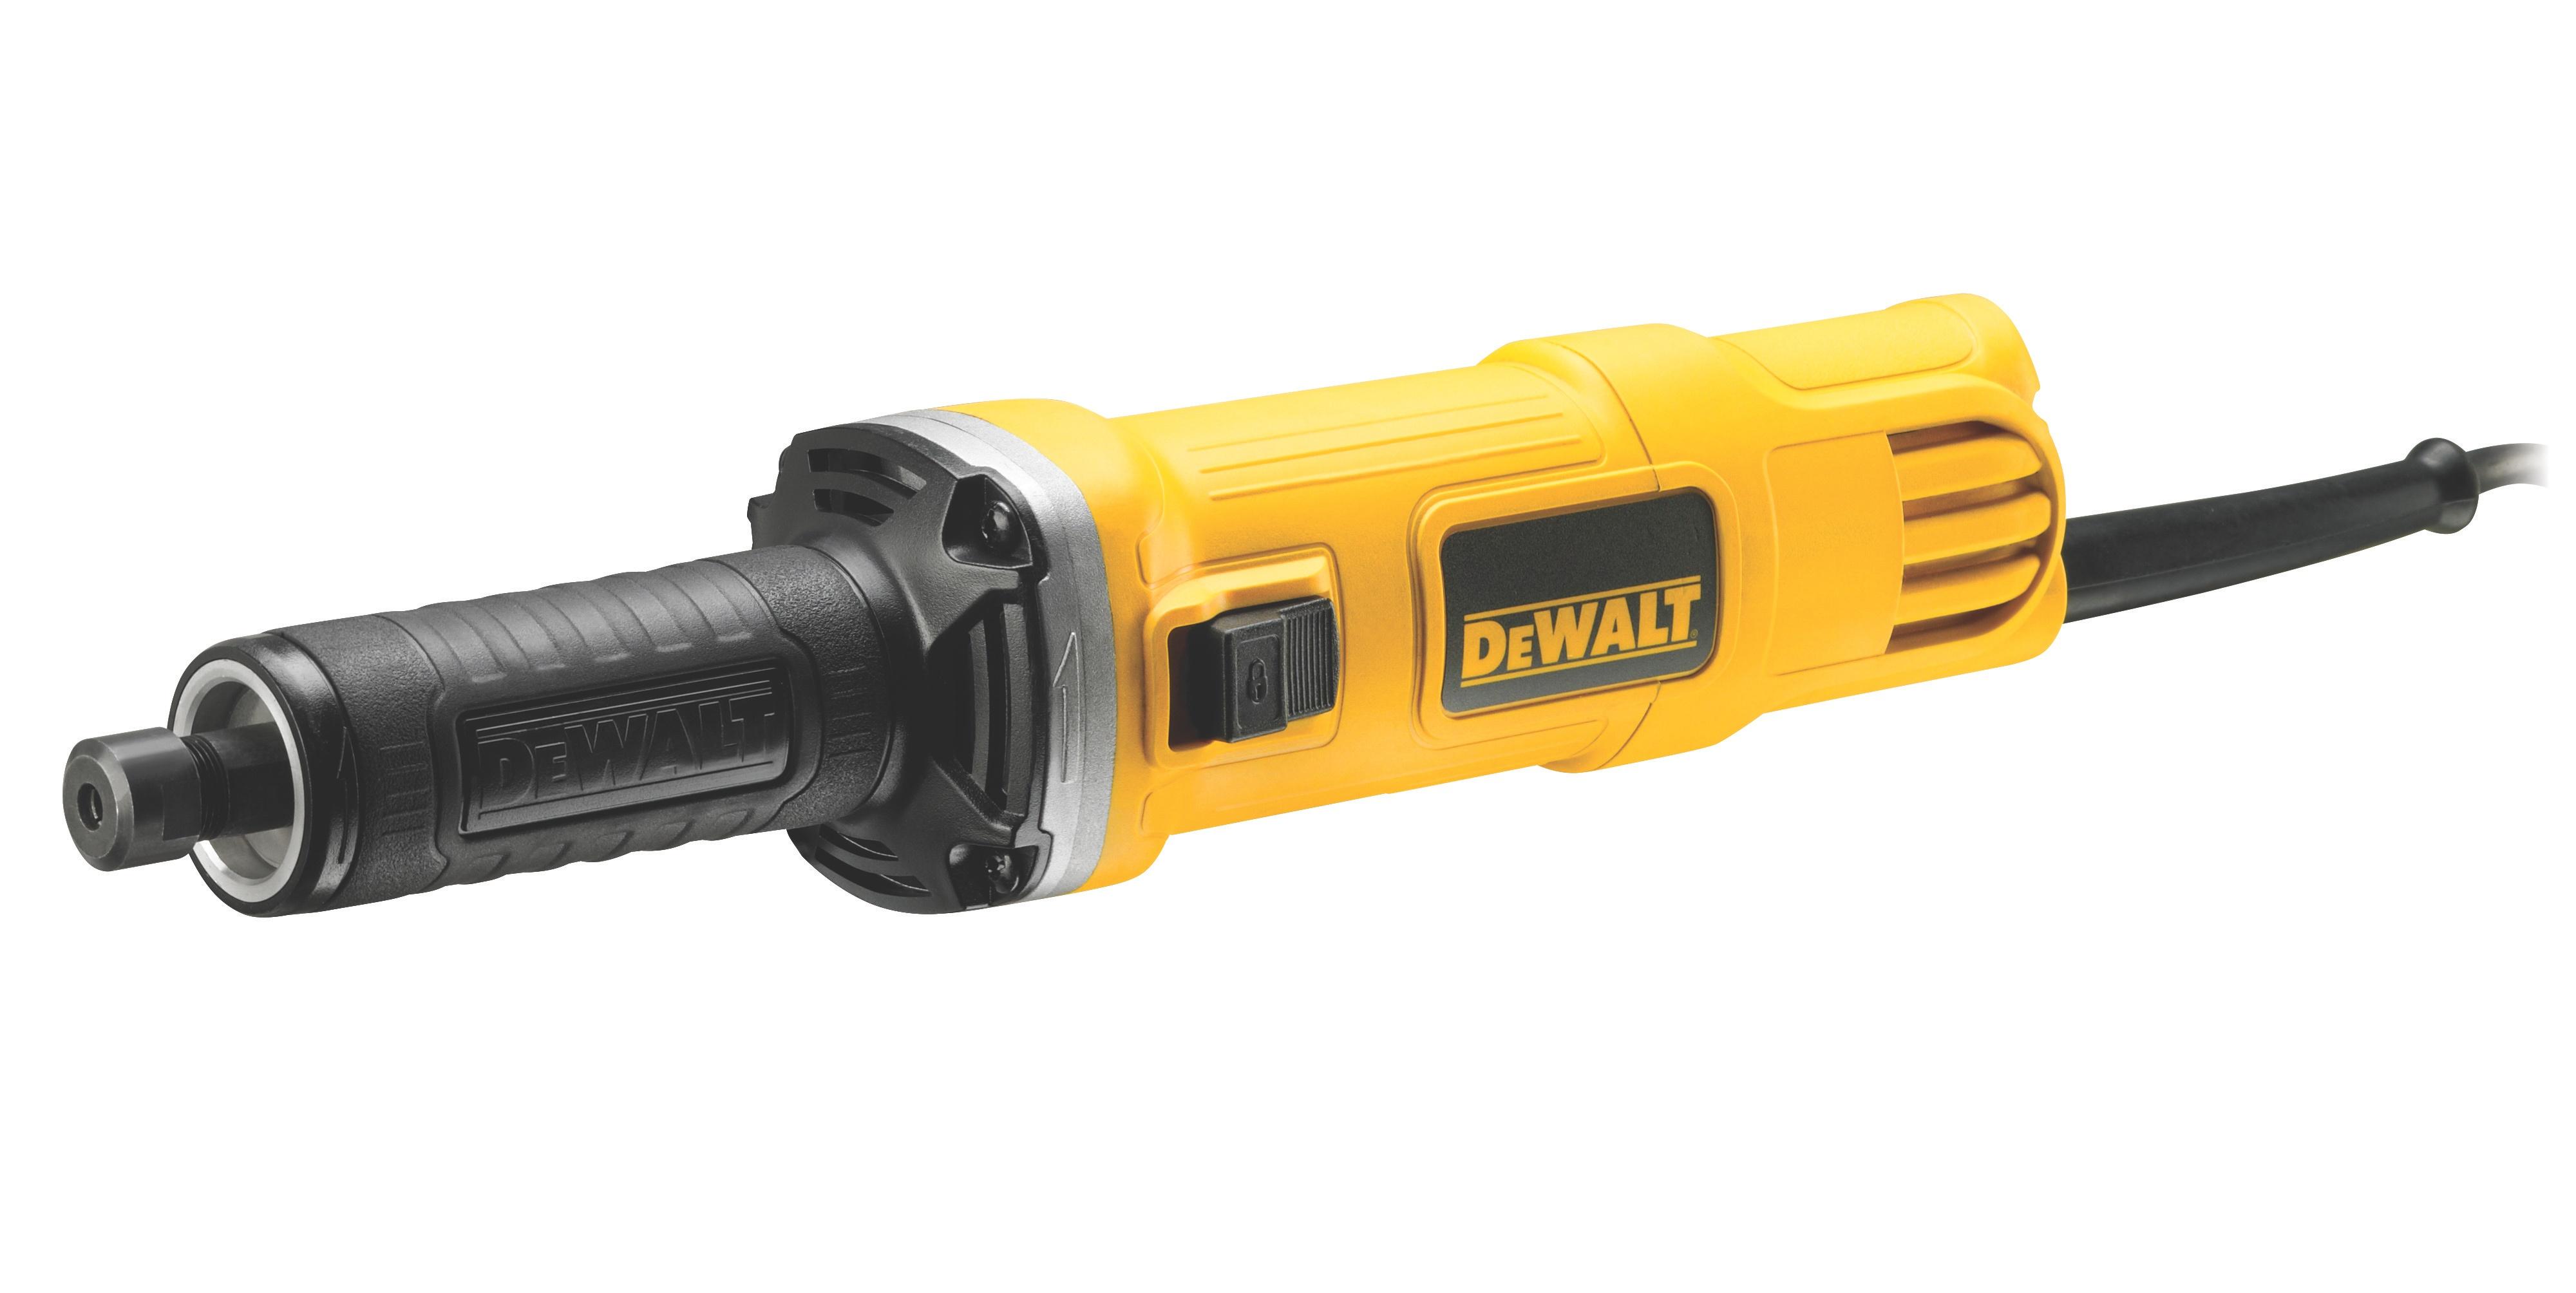 Přímá bruska 450 W ,6 mm s posuvným spínačem DeWALT - DWE4884